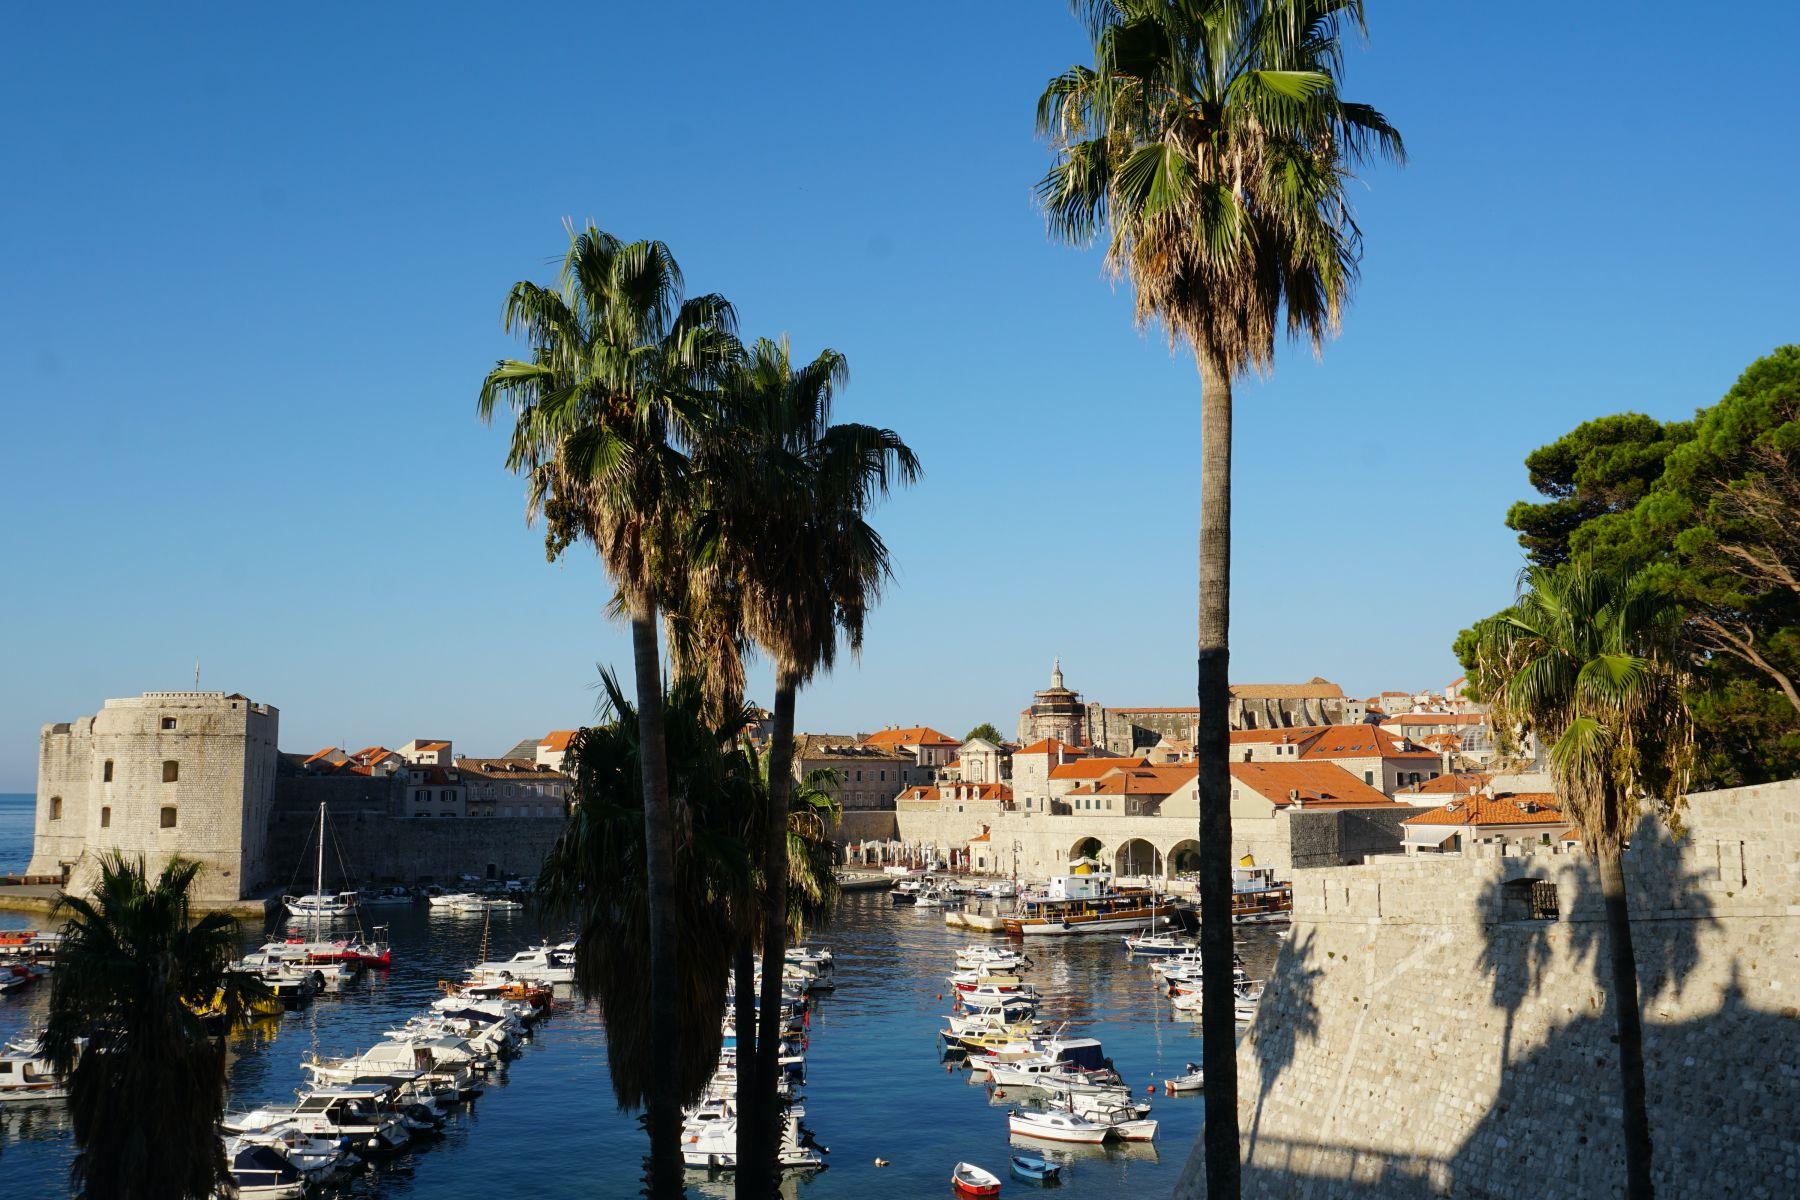 Dubrovnik, Croatia, Photo by Inera Isovic on Unsplash